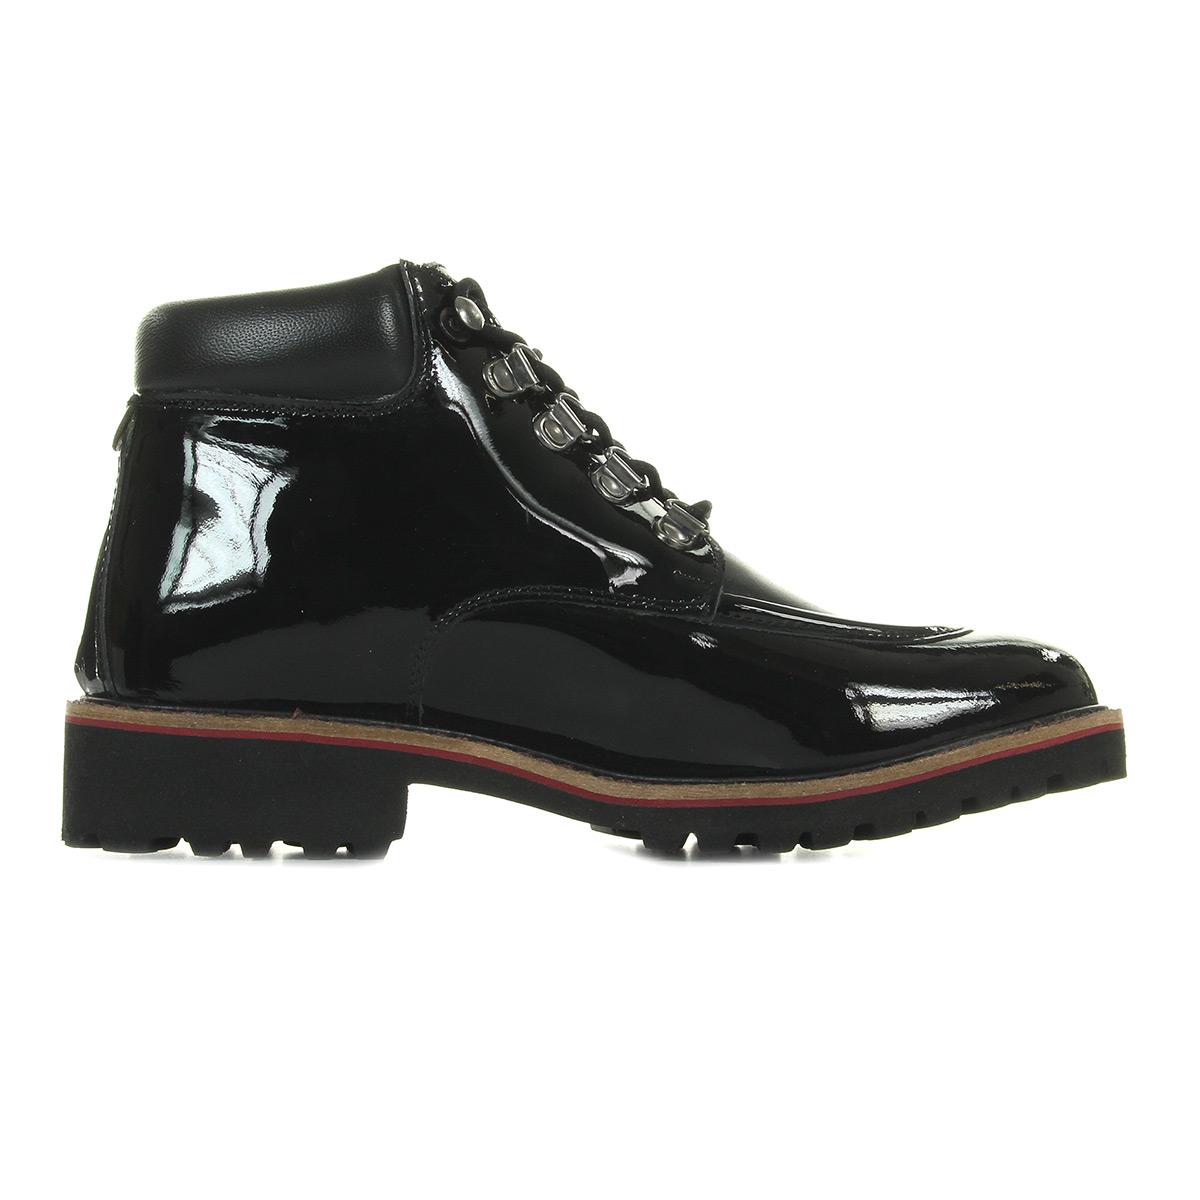 Kickers Reno Cuir Noir 578720508, Boots femme